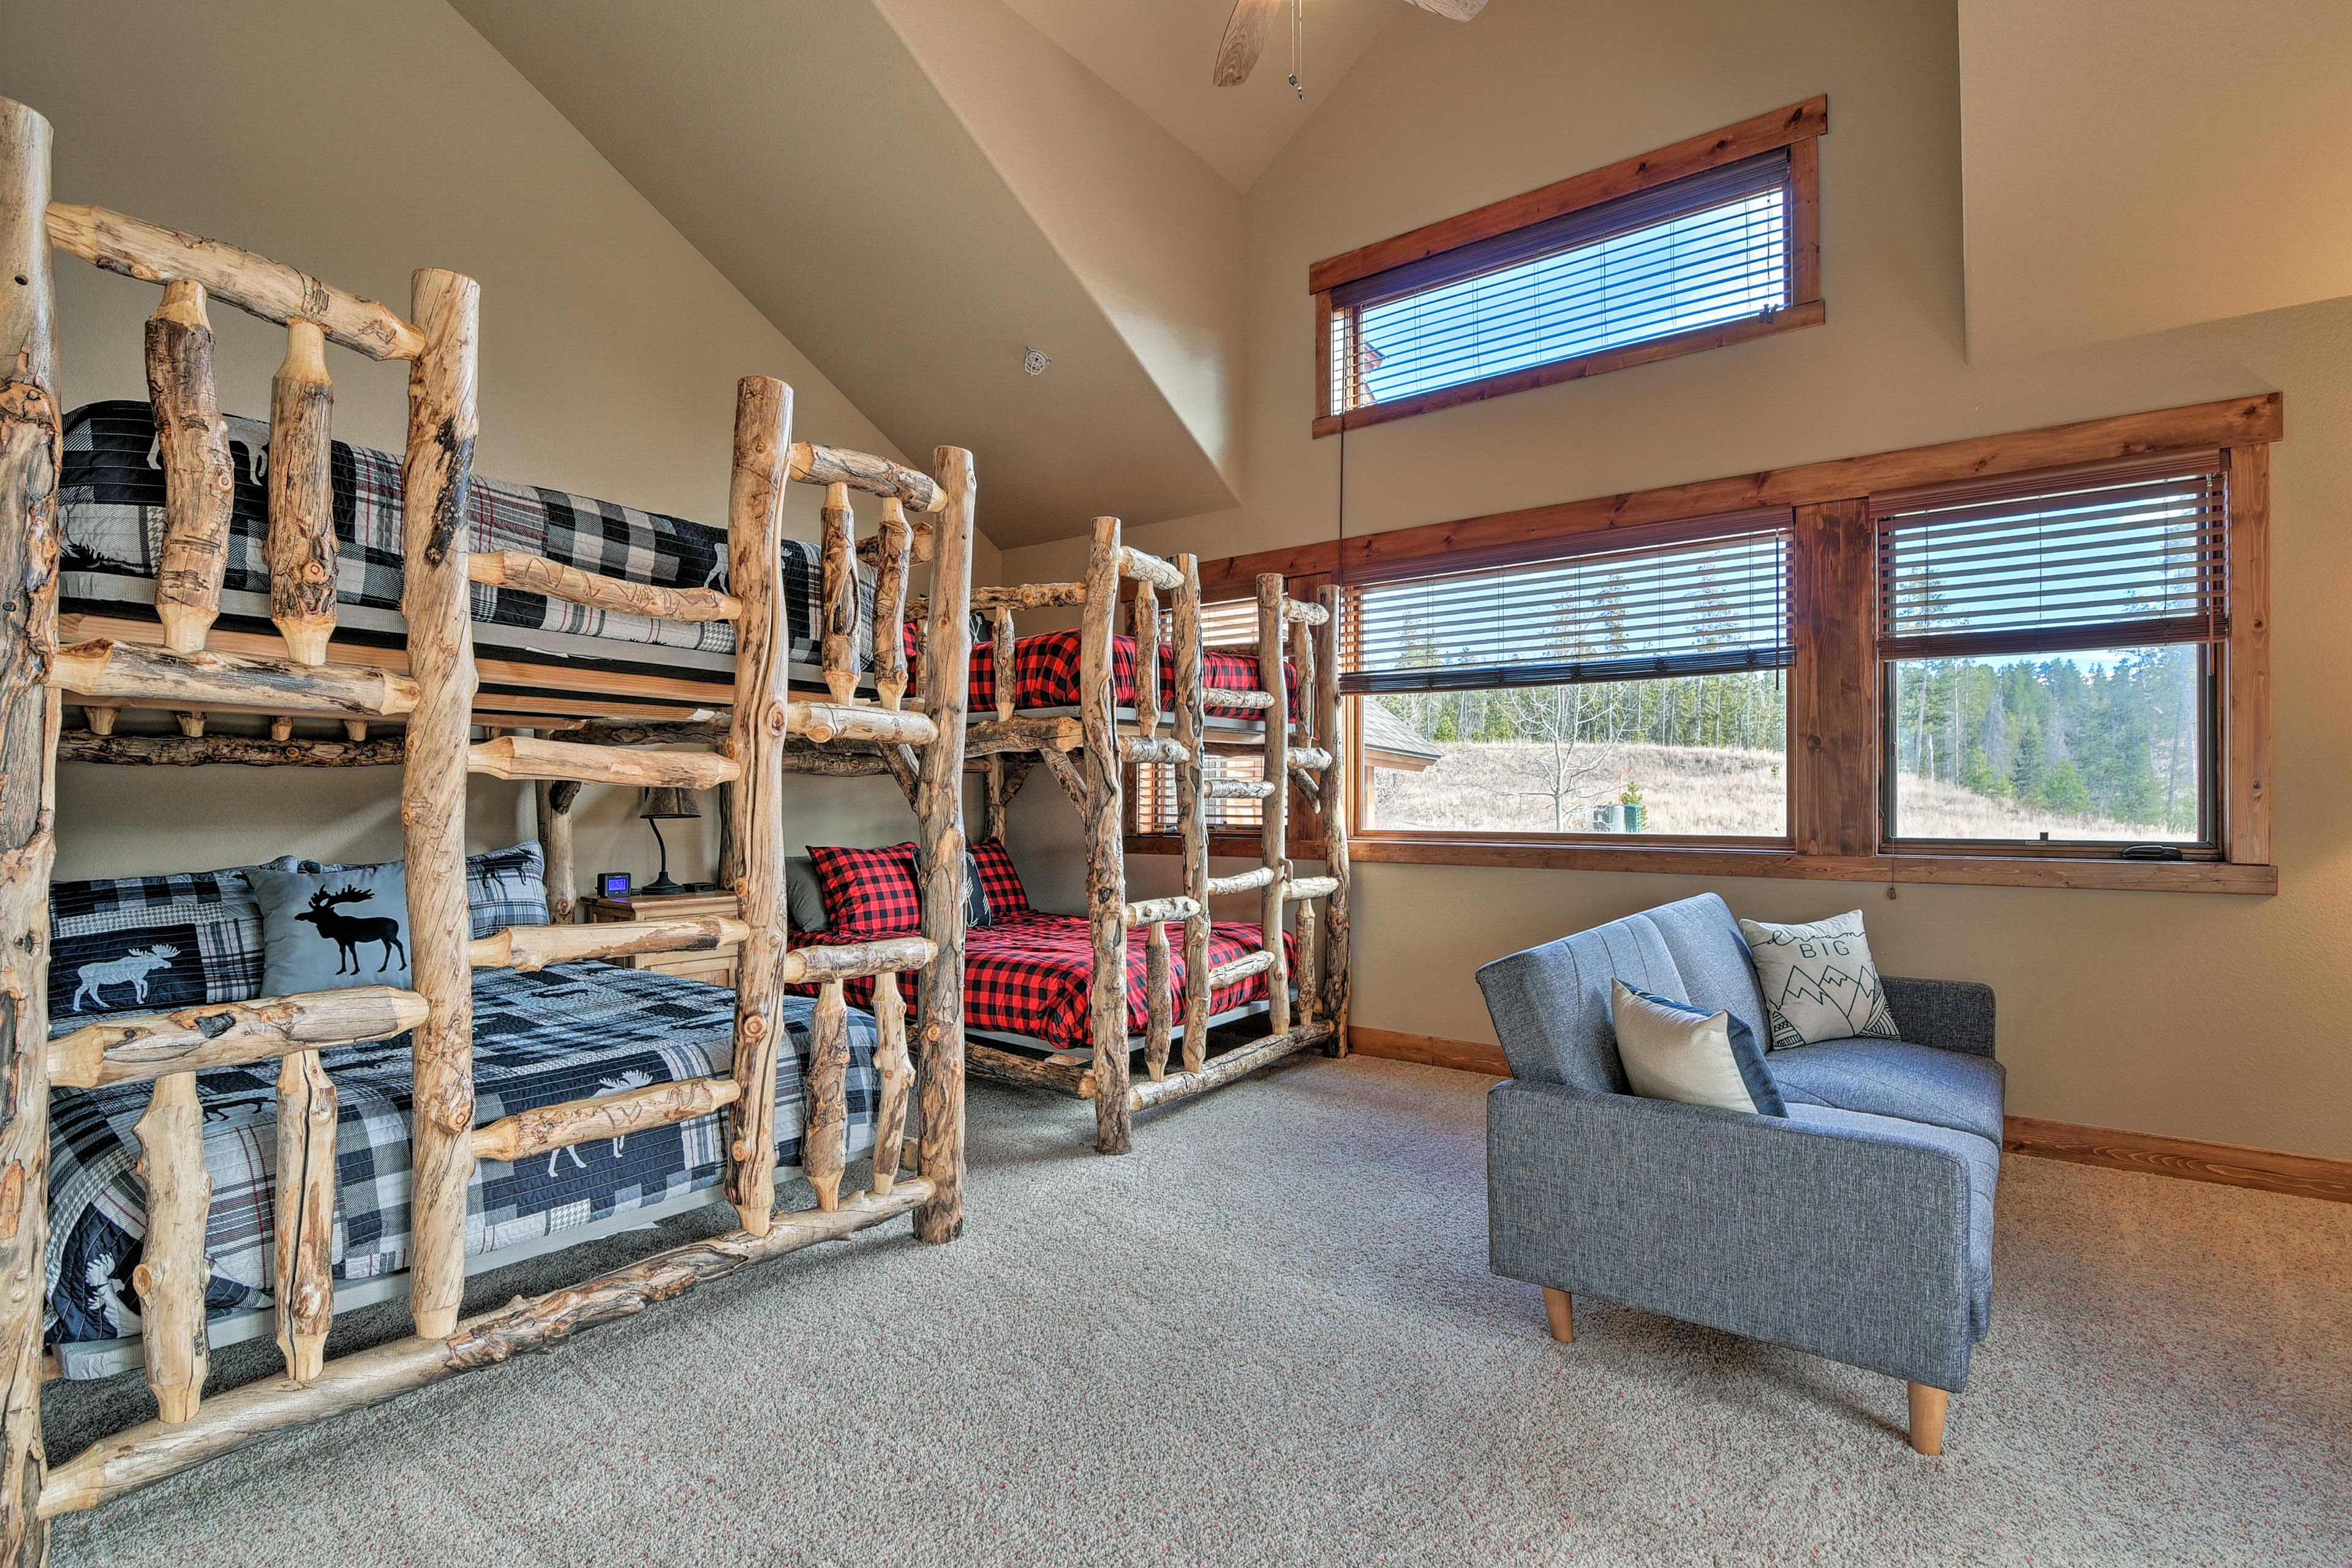 This room features full-over-queen and queen-over-queen adult bunk beds.